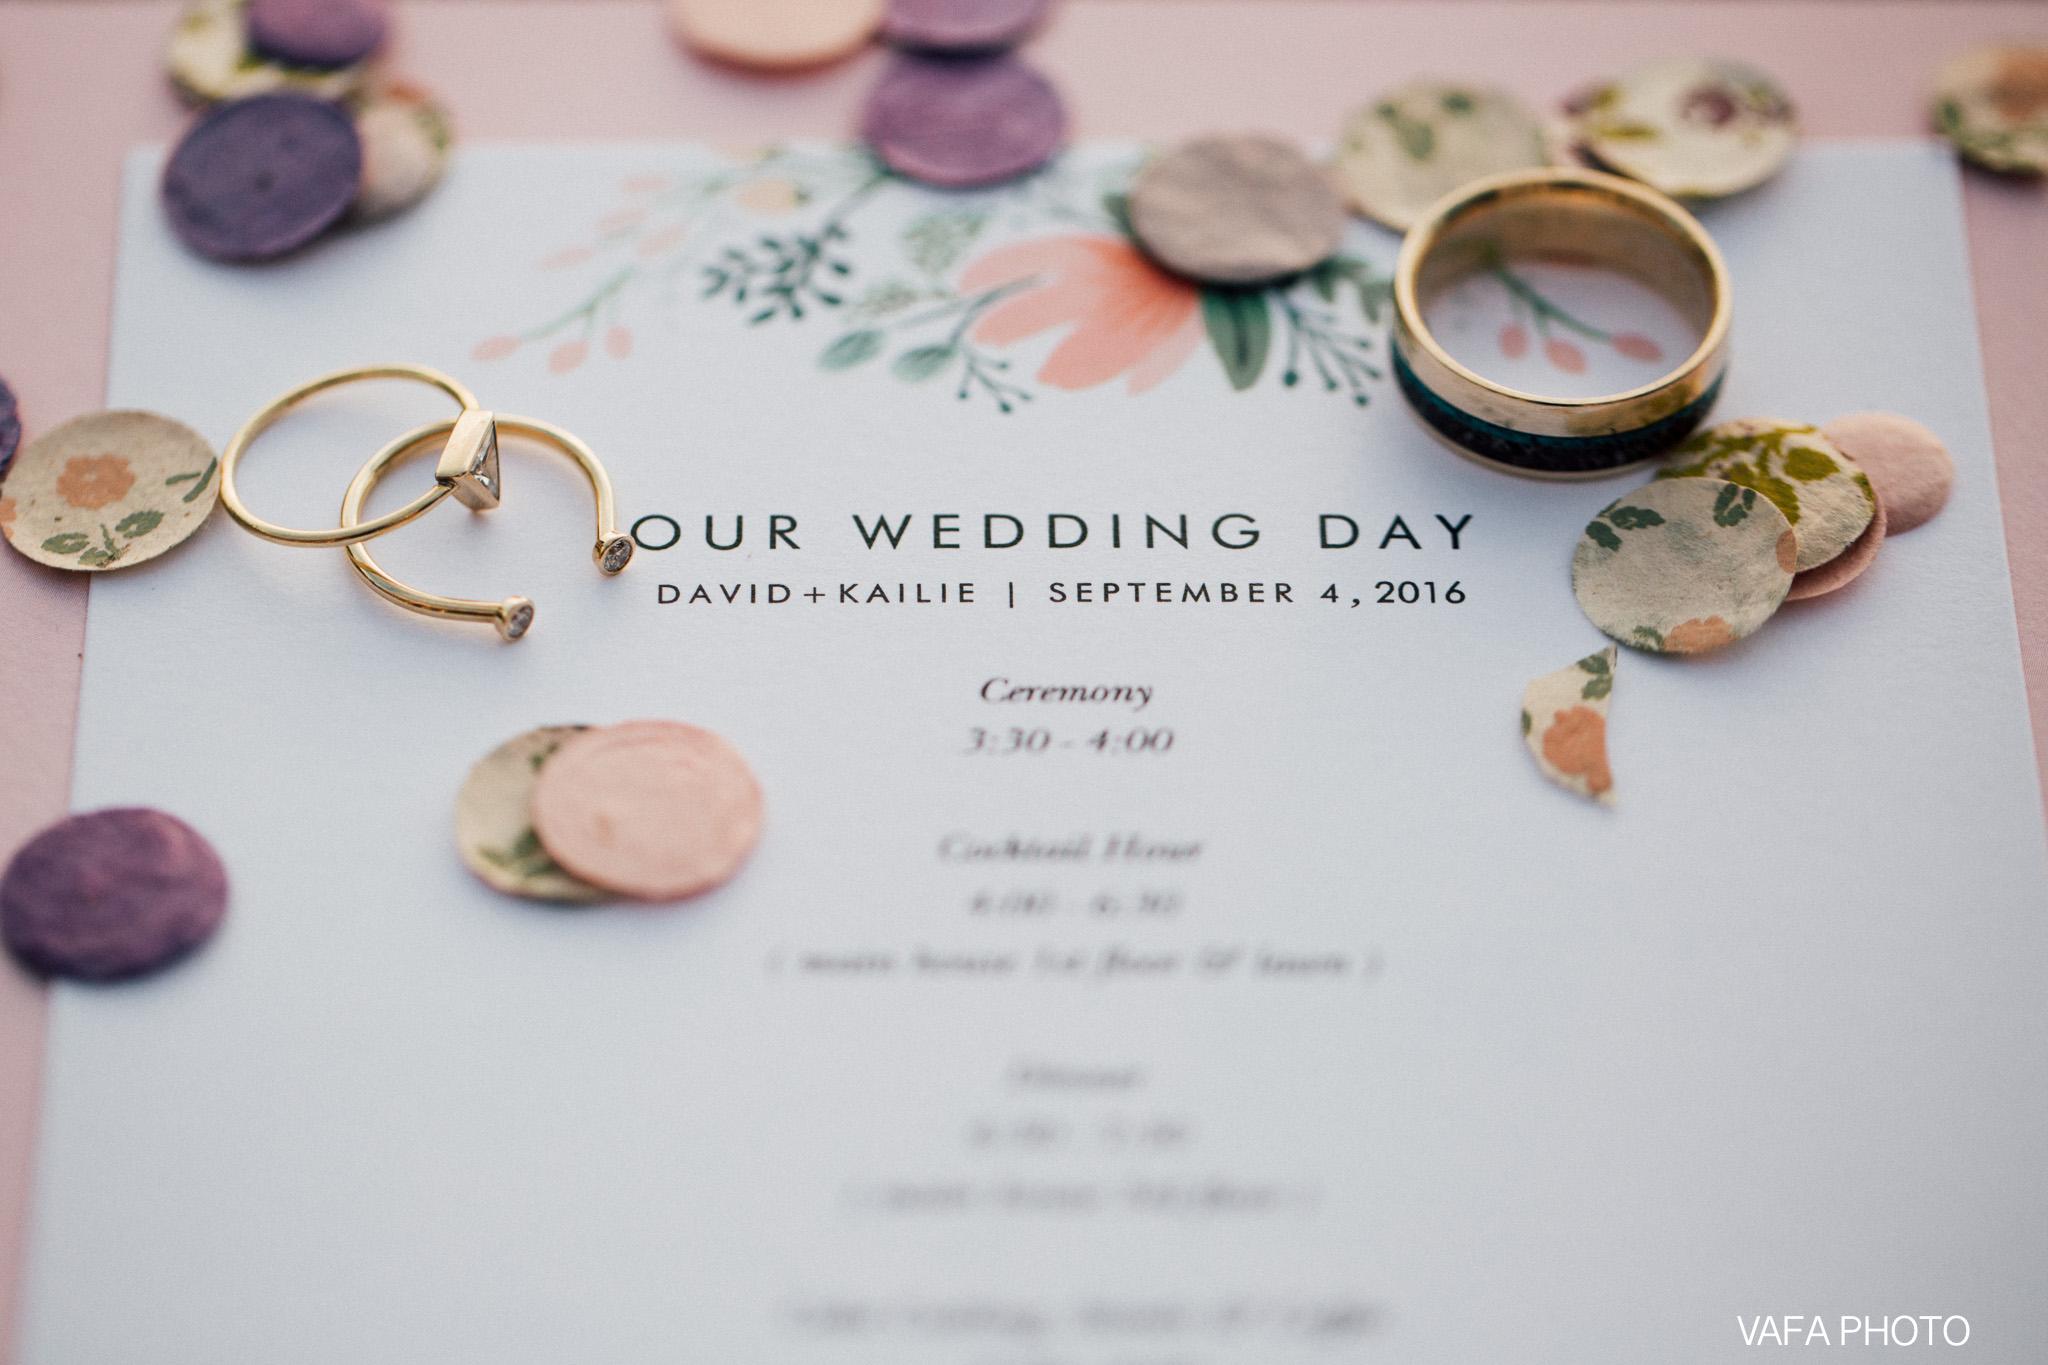 The-Felt-Estate-Wedding-Kailie-David-Vafa-Photo-5.jpg